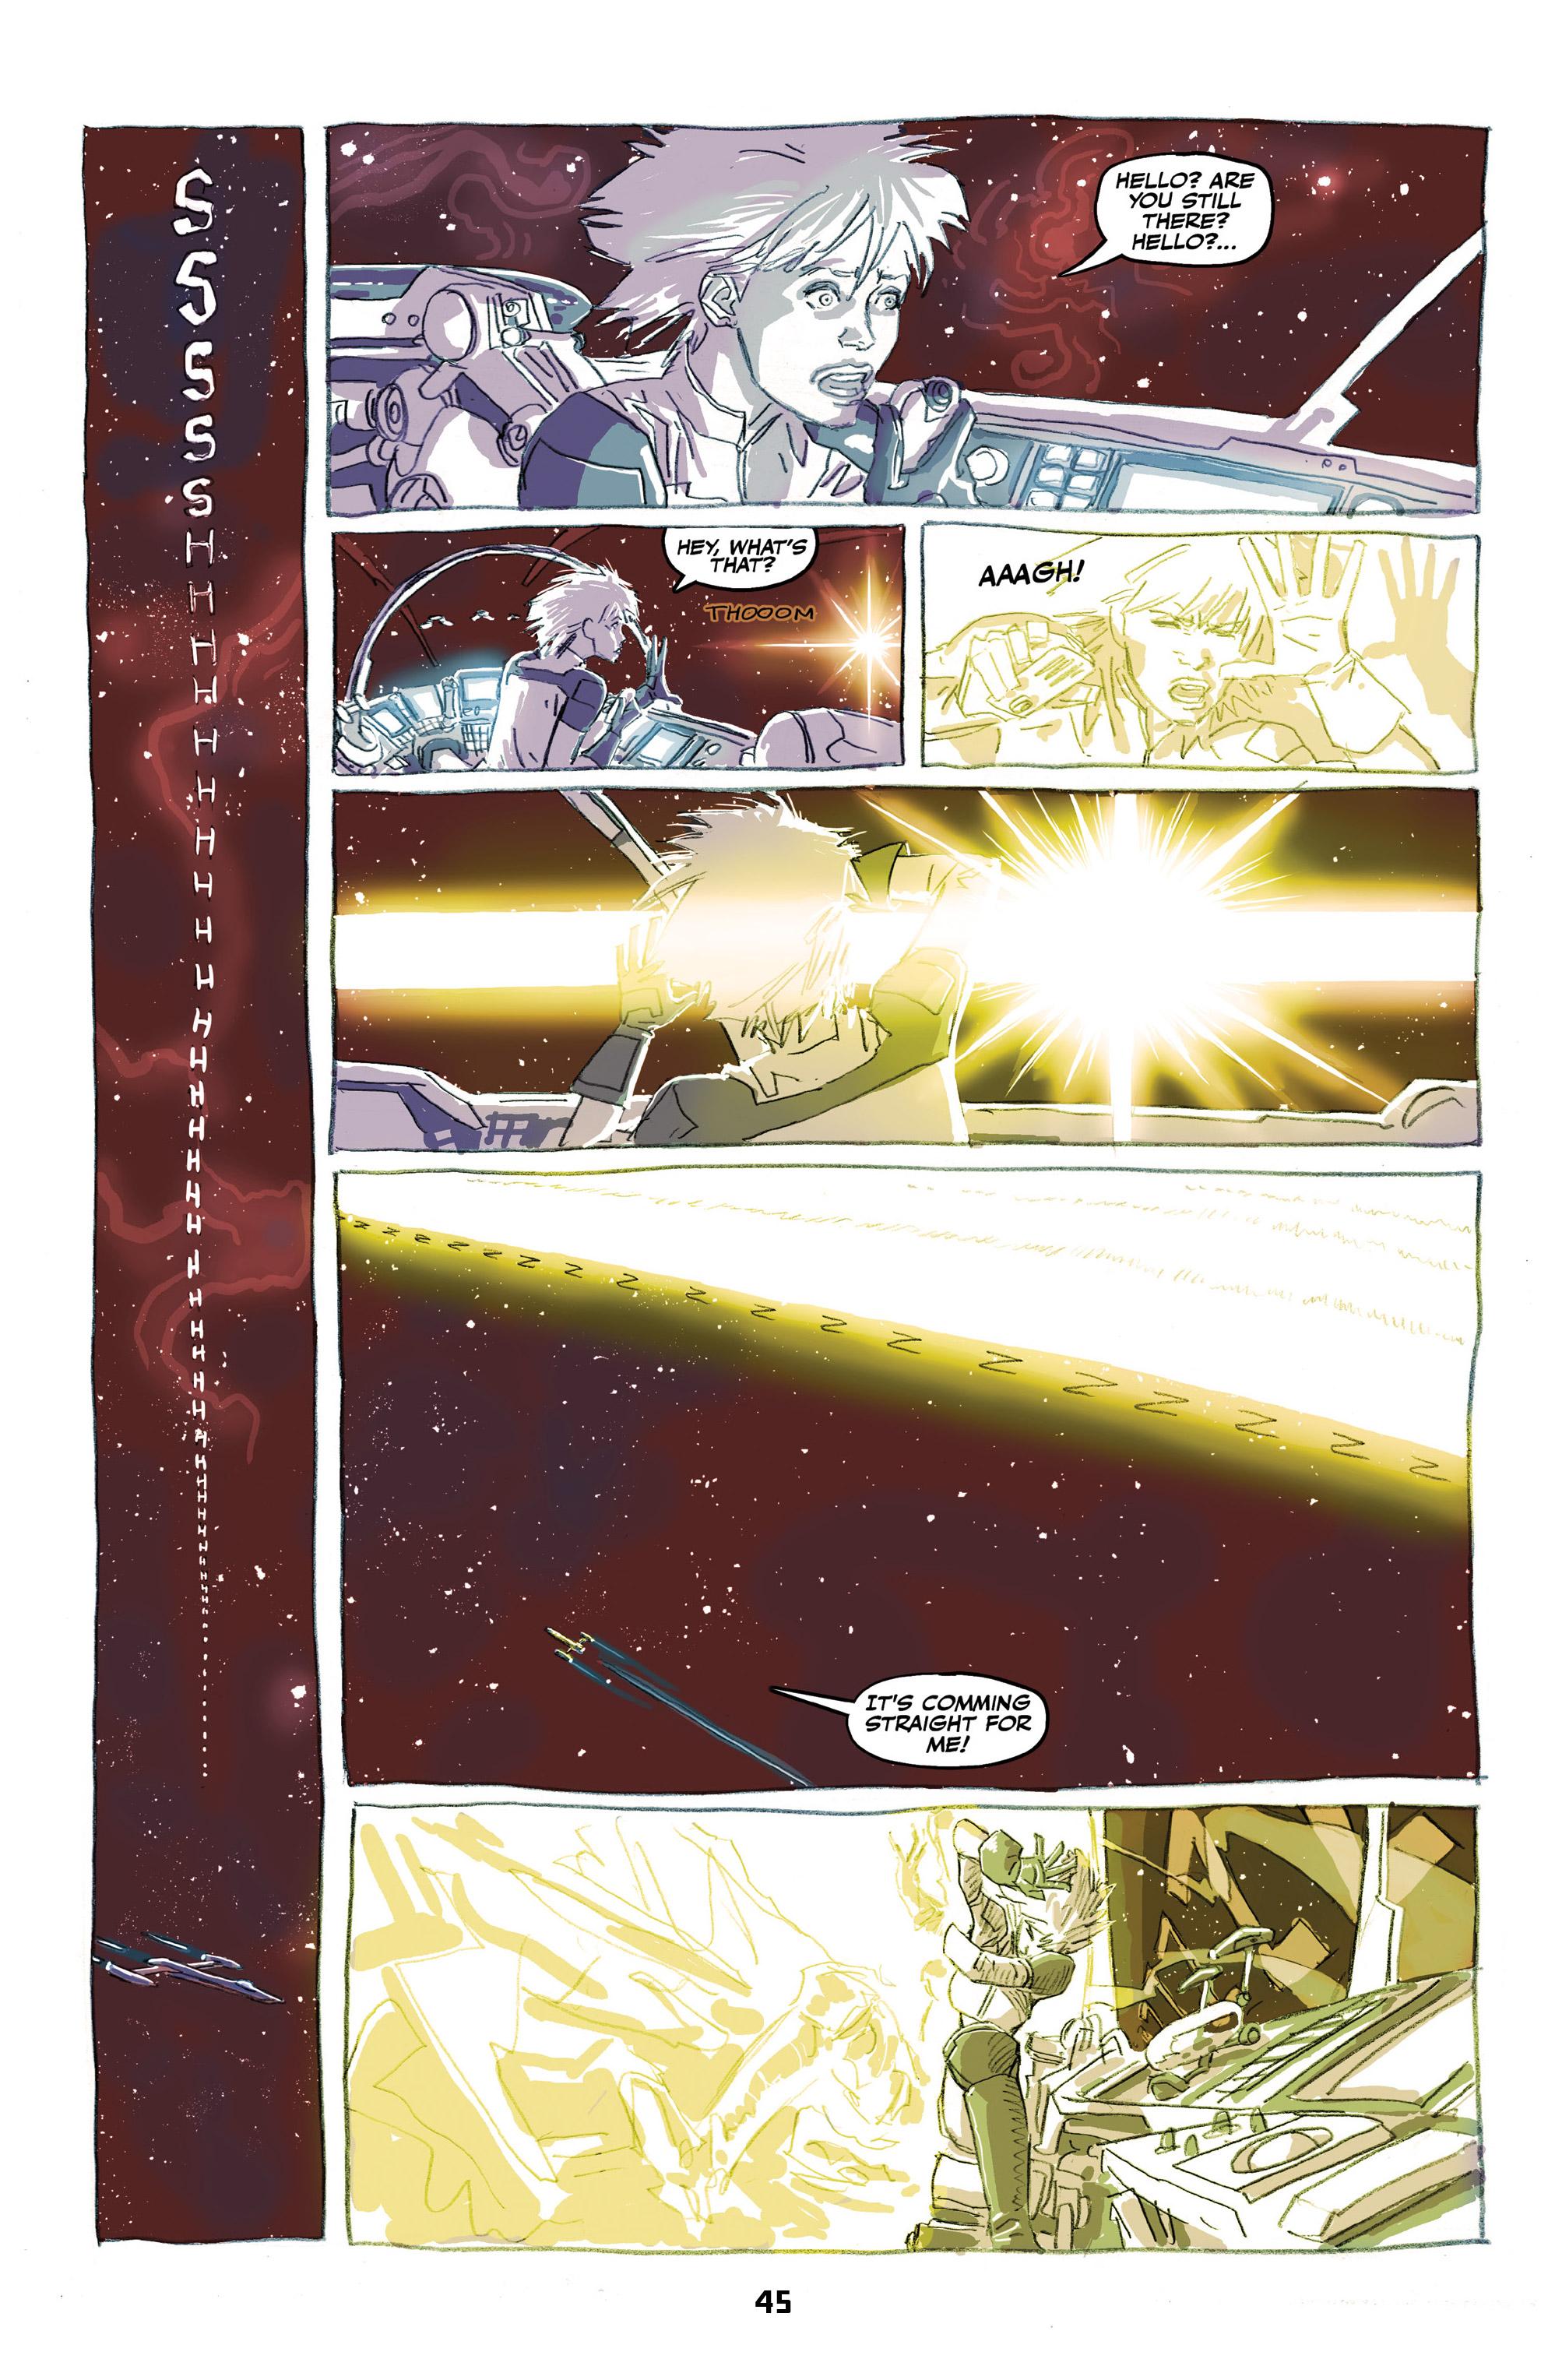 Read online Paklis comic -  Issue #1 - 46